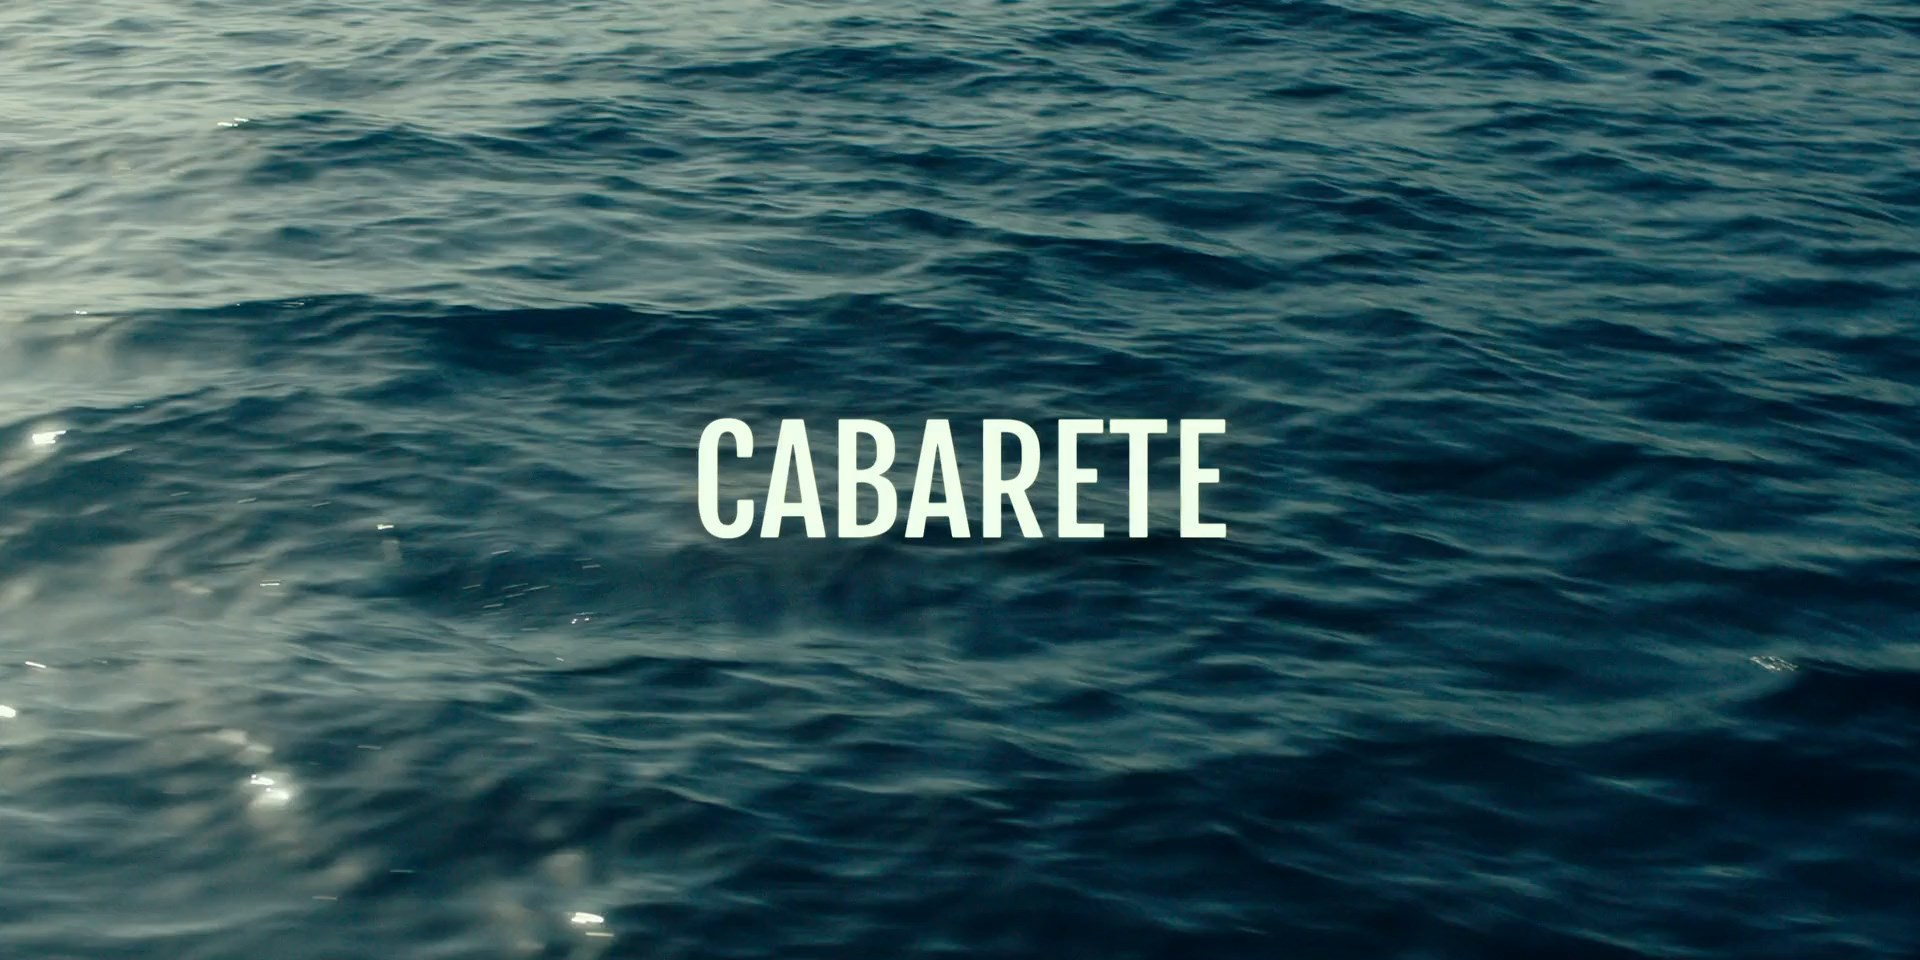 Cabarete (2020) 1080p WEB-DL AMZN Latino